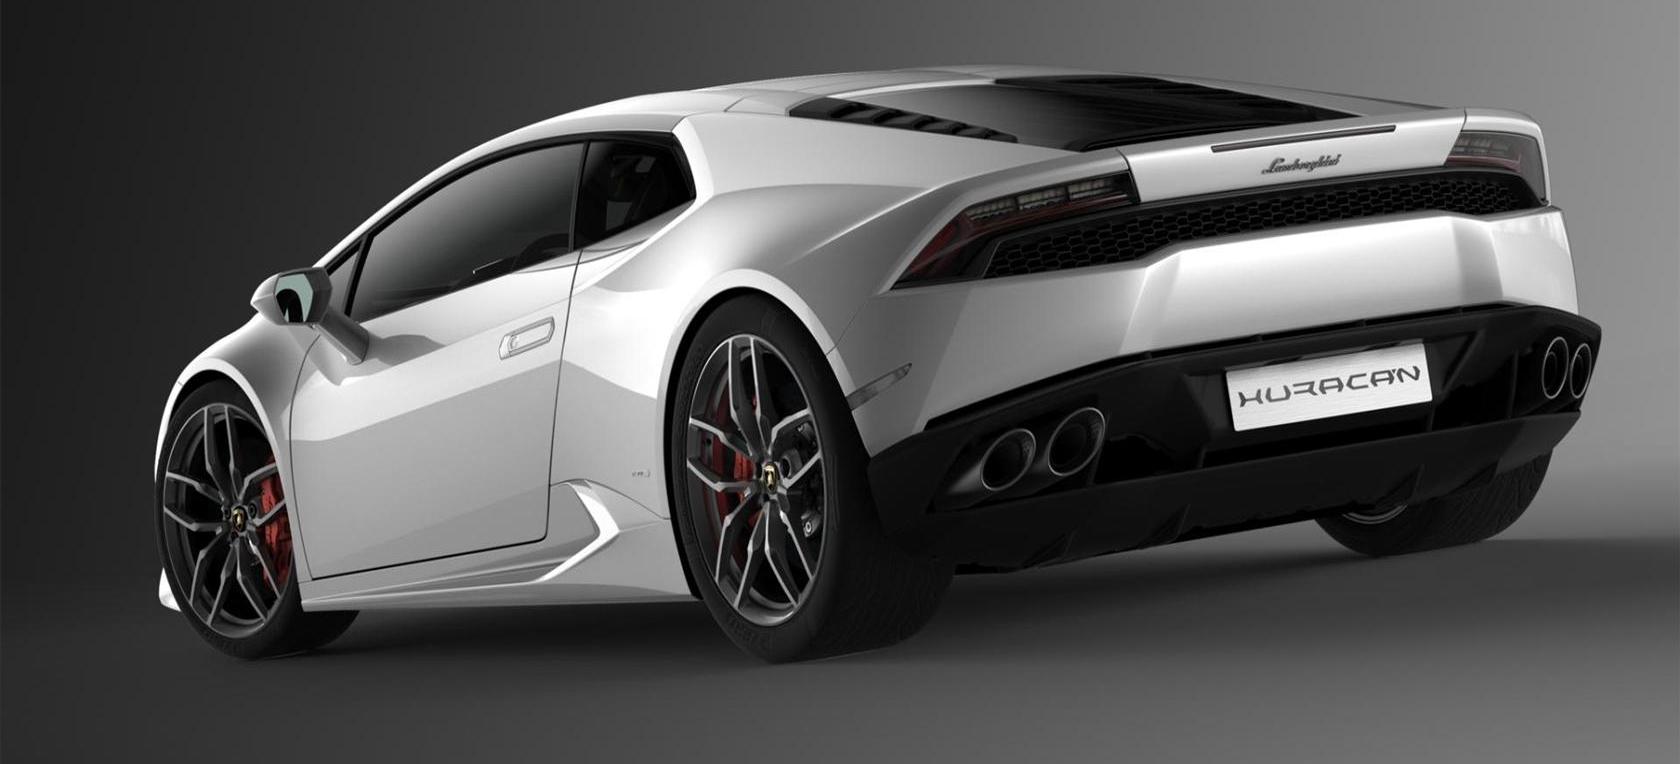 Lamborghini Huracan LP 610 4 07 1680 Lamborghini Huracan LP610 4